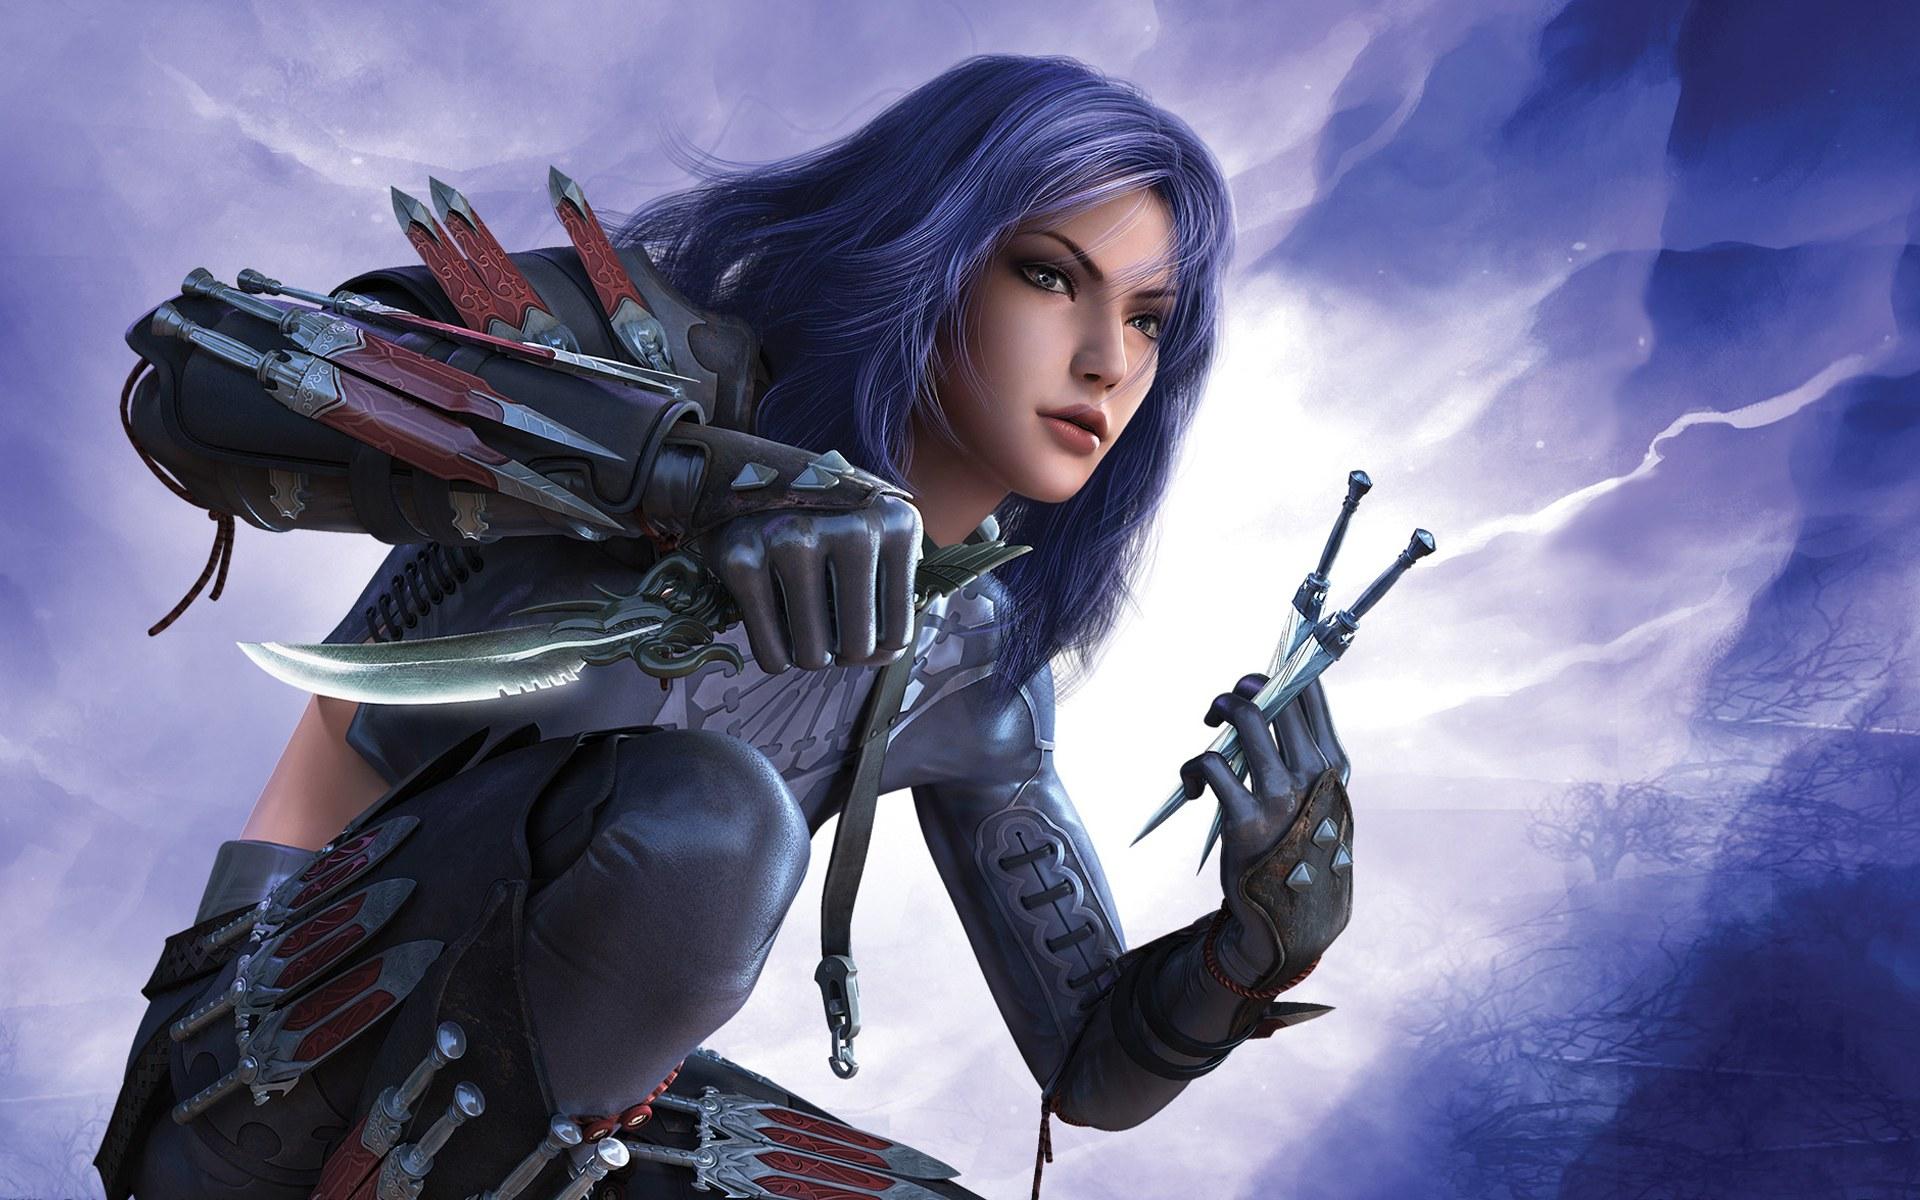 chica Fantasy   Asesino fondos de pantalla chica Fantasy   Asesino 1920x1200